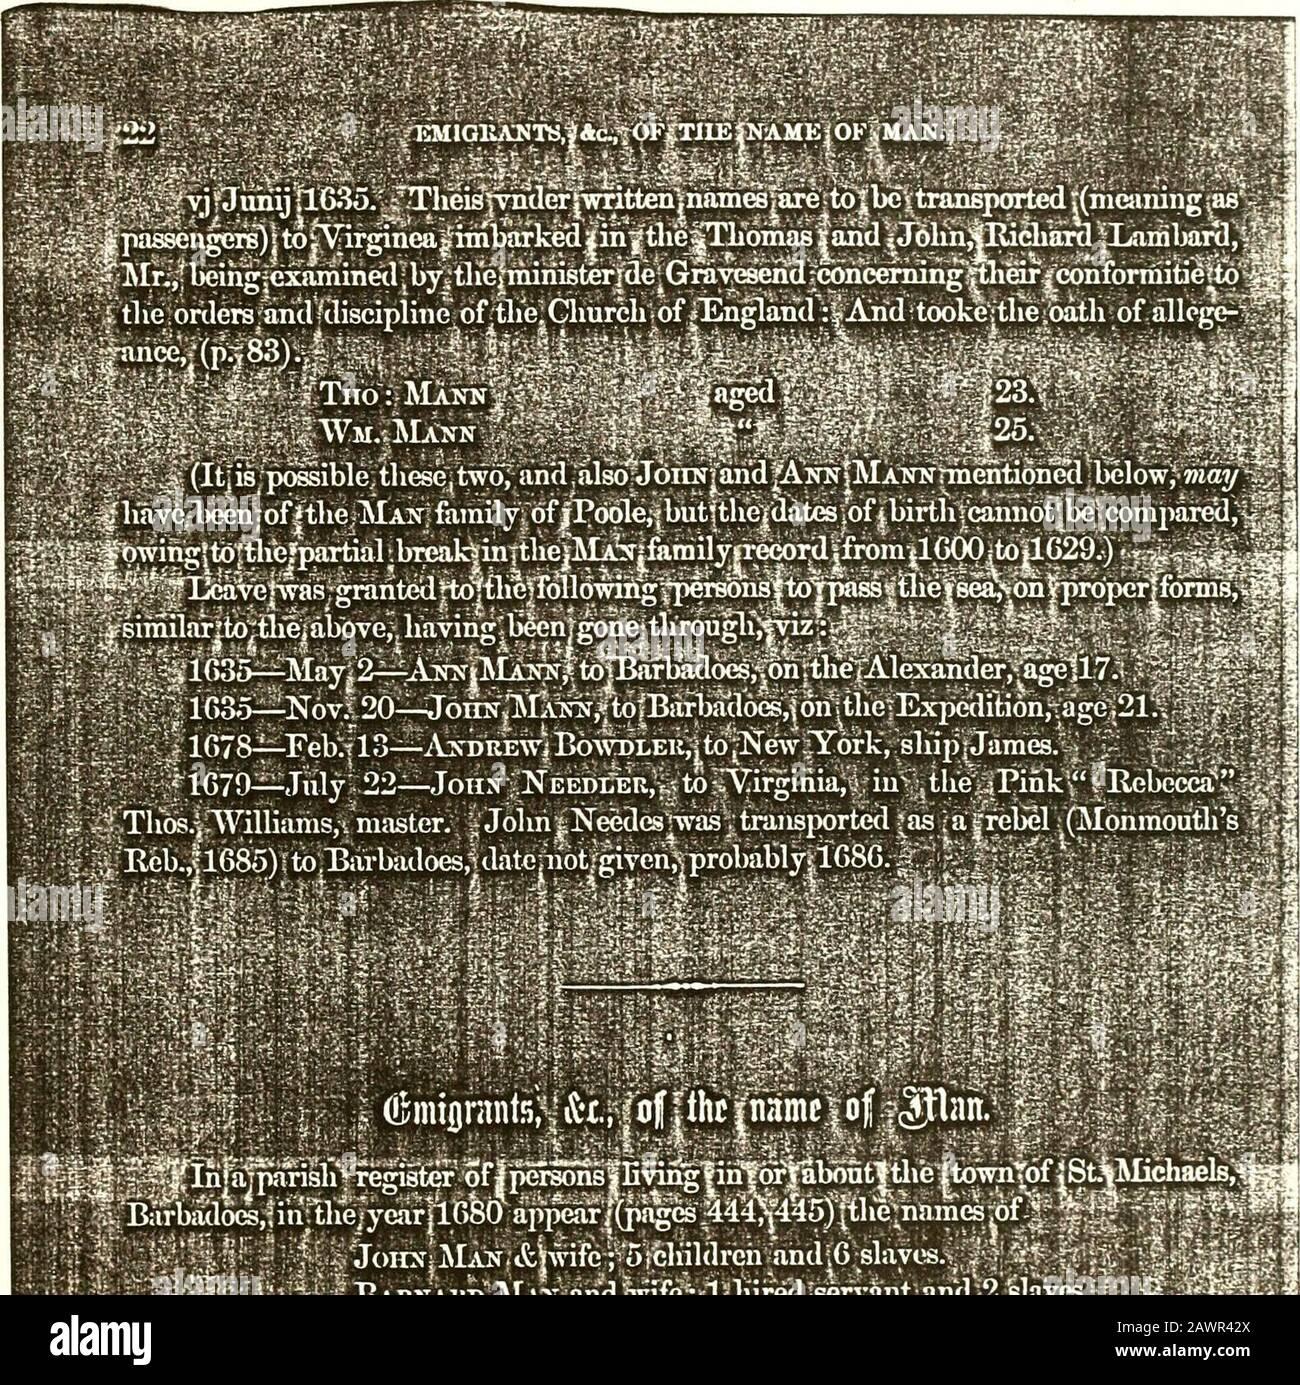 Record of the Man, Needles (Nedels) and Hambleton families...1495-1876 . 1.1/, At J.-Ail C 1.1 .III ^ HllV/ij =-*. Ji yp~ga? :TIIK IMaST* FAMIEY|iN |NEW|ENGlU>n>.: tf-proof/of fcl .-SKftB ppointe^jJohni|Manne/|Genk^to^i^andjof|3aTnaic^uring^le^namcpvmby|£]iet6ne(vritingjtheH^ JIt ,is - ; -:Ellinor 1IkhVdler,^ arey here noticed fbecauseiof jtheirfclosedapproacli^to^^KDELS Sfhc ^an^^iinils finMmf (Bnflland; - freemen joft 1*1 ;i)mu>iio SUS ^S*skTs ?*fe -/-• .M||S^, reprimanded ti /, 1082. : He| isfmeritiohed j^as .oijieifof jthe| survey ois^of Eehobotli^Jiine 9,^1(383^1M..aiidas having Stock Photo